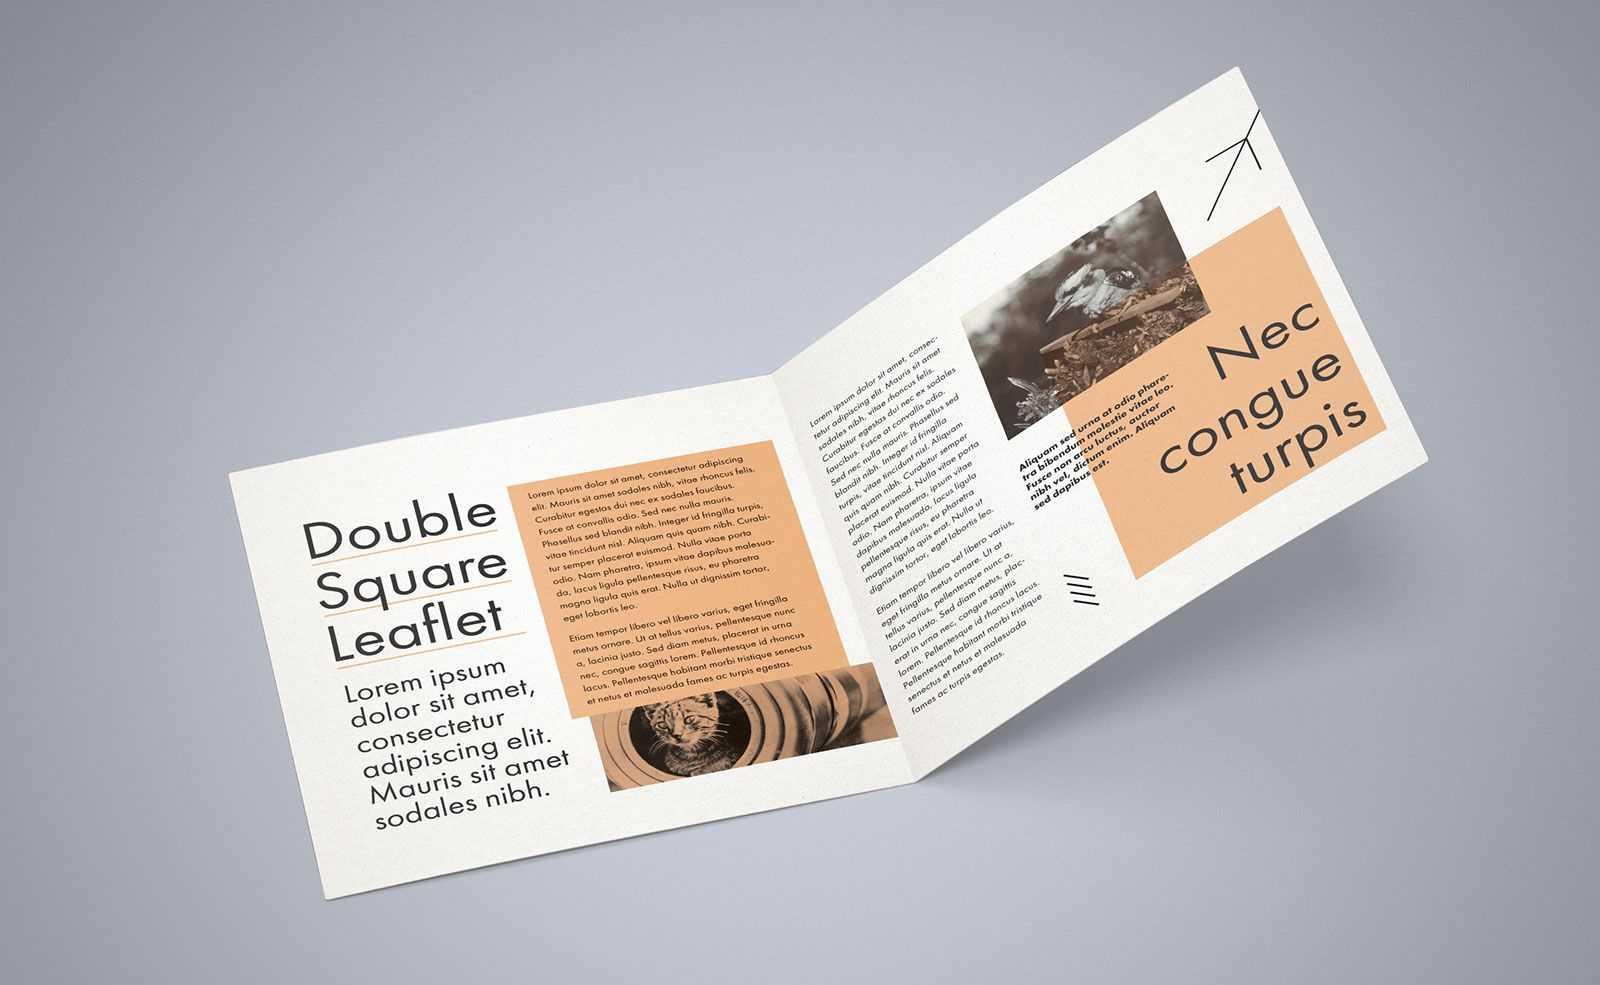 Free Square Bi Fold Brochure Mockup Psd File 2 | Bi Fold Inside 2 Fold Brochure Template Free